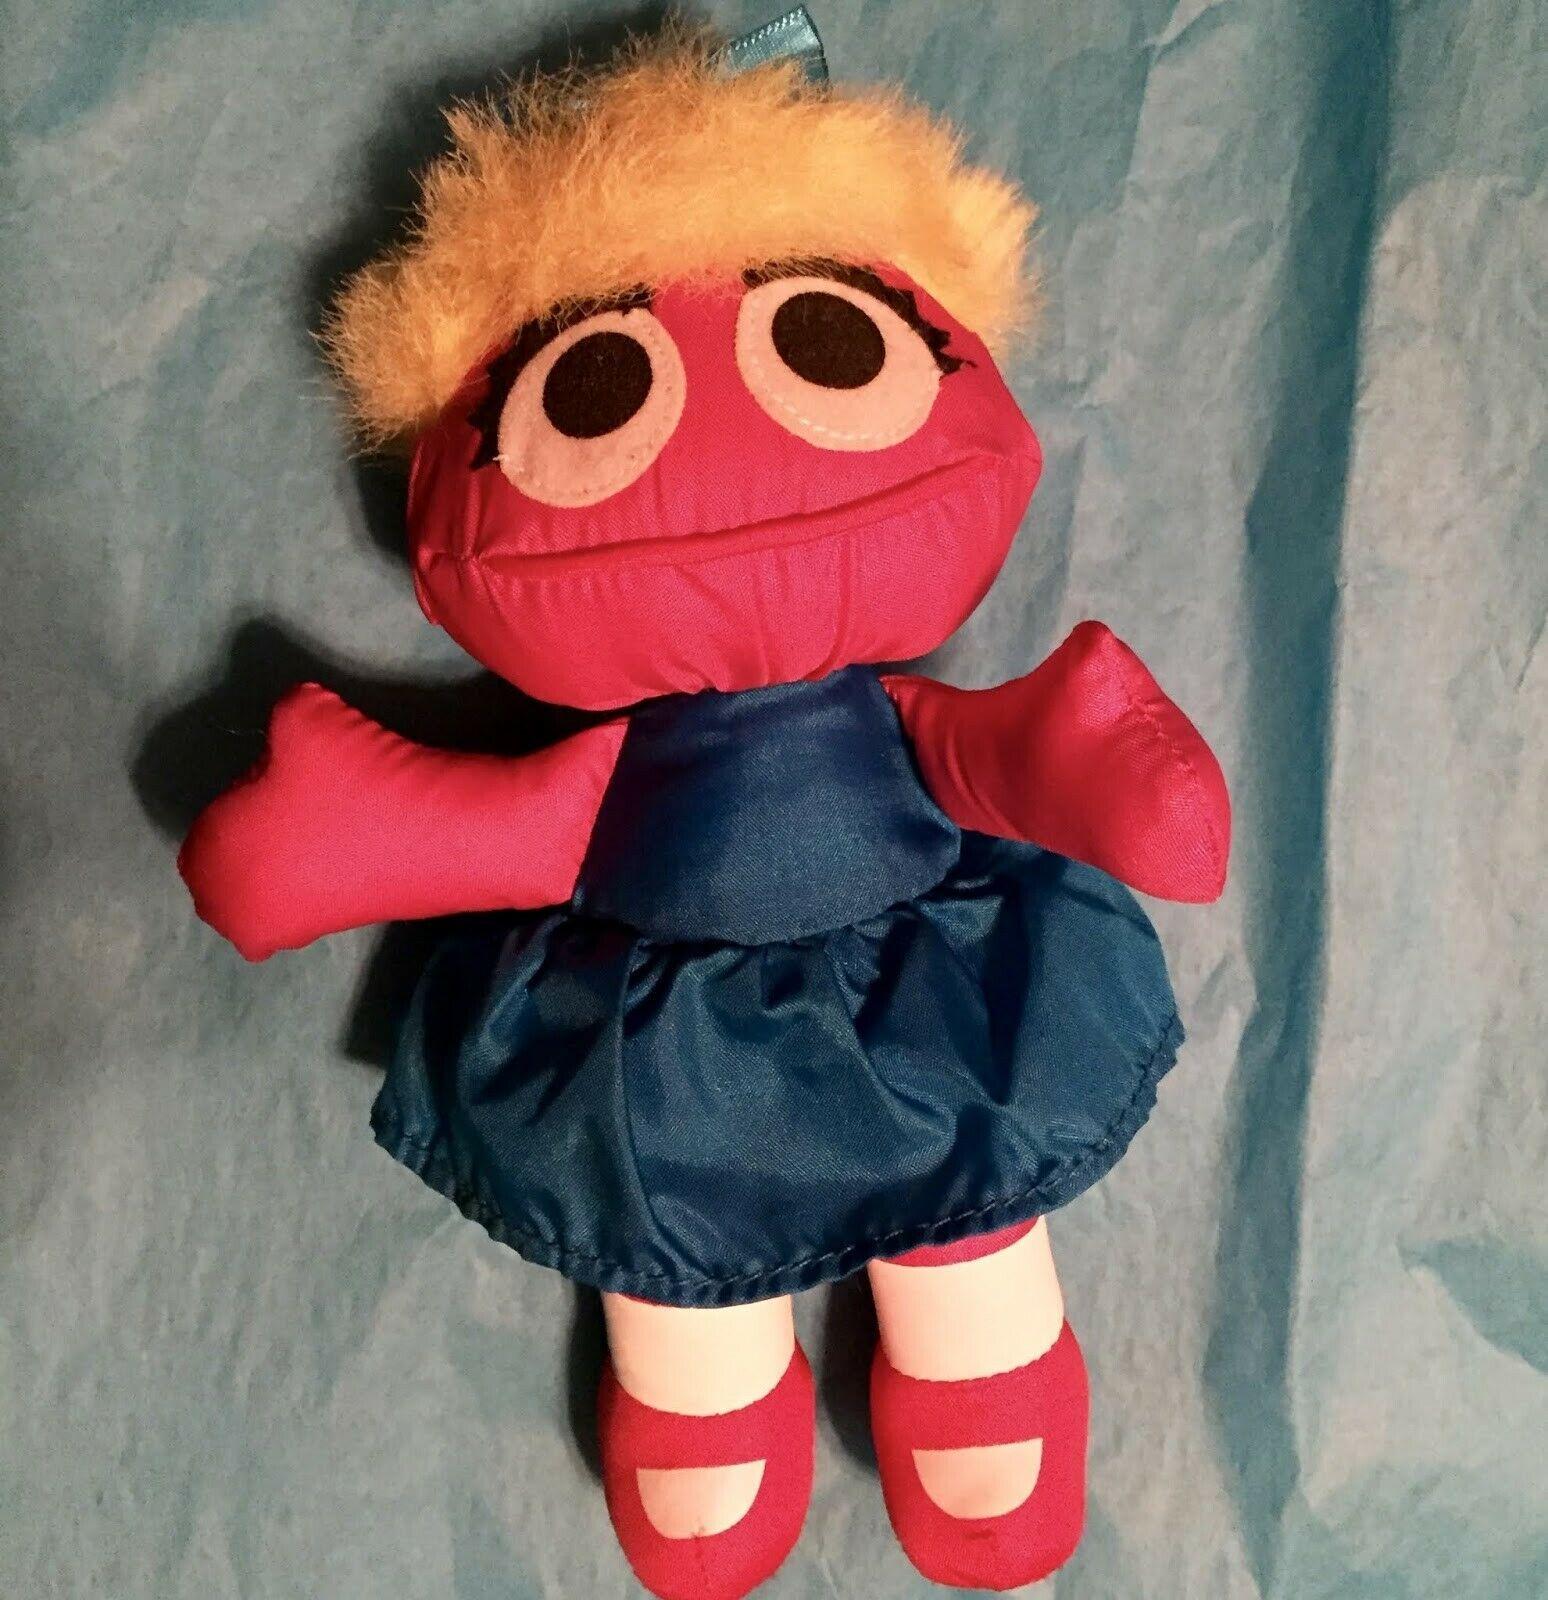 Hasbro Sesame Street Prairie Dawn 7 Small And 20 Similar Items